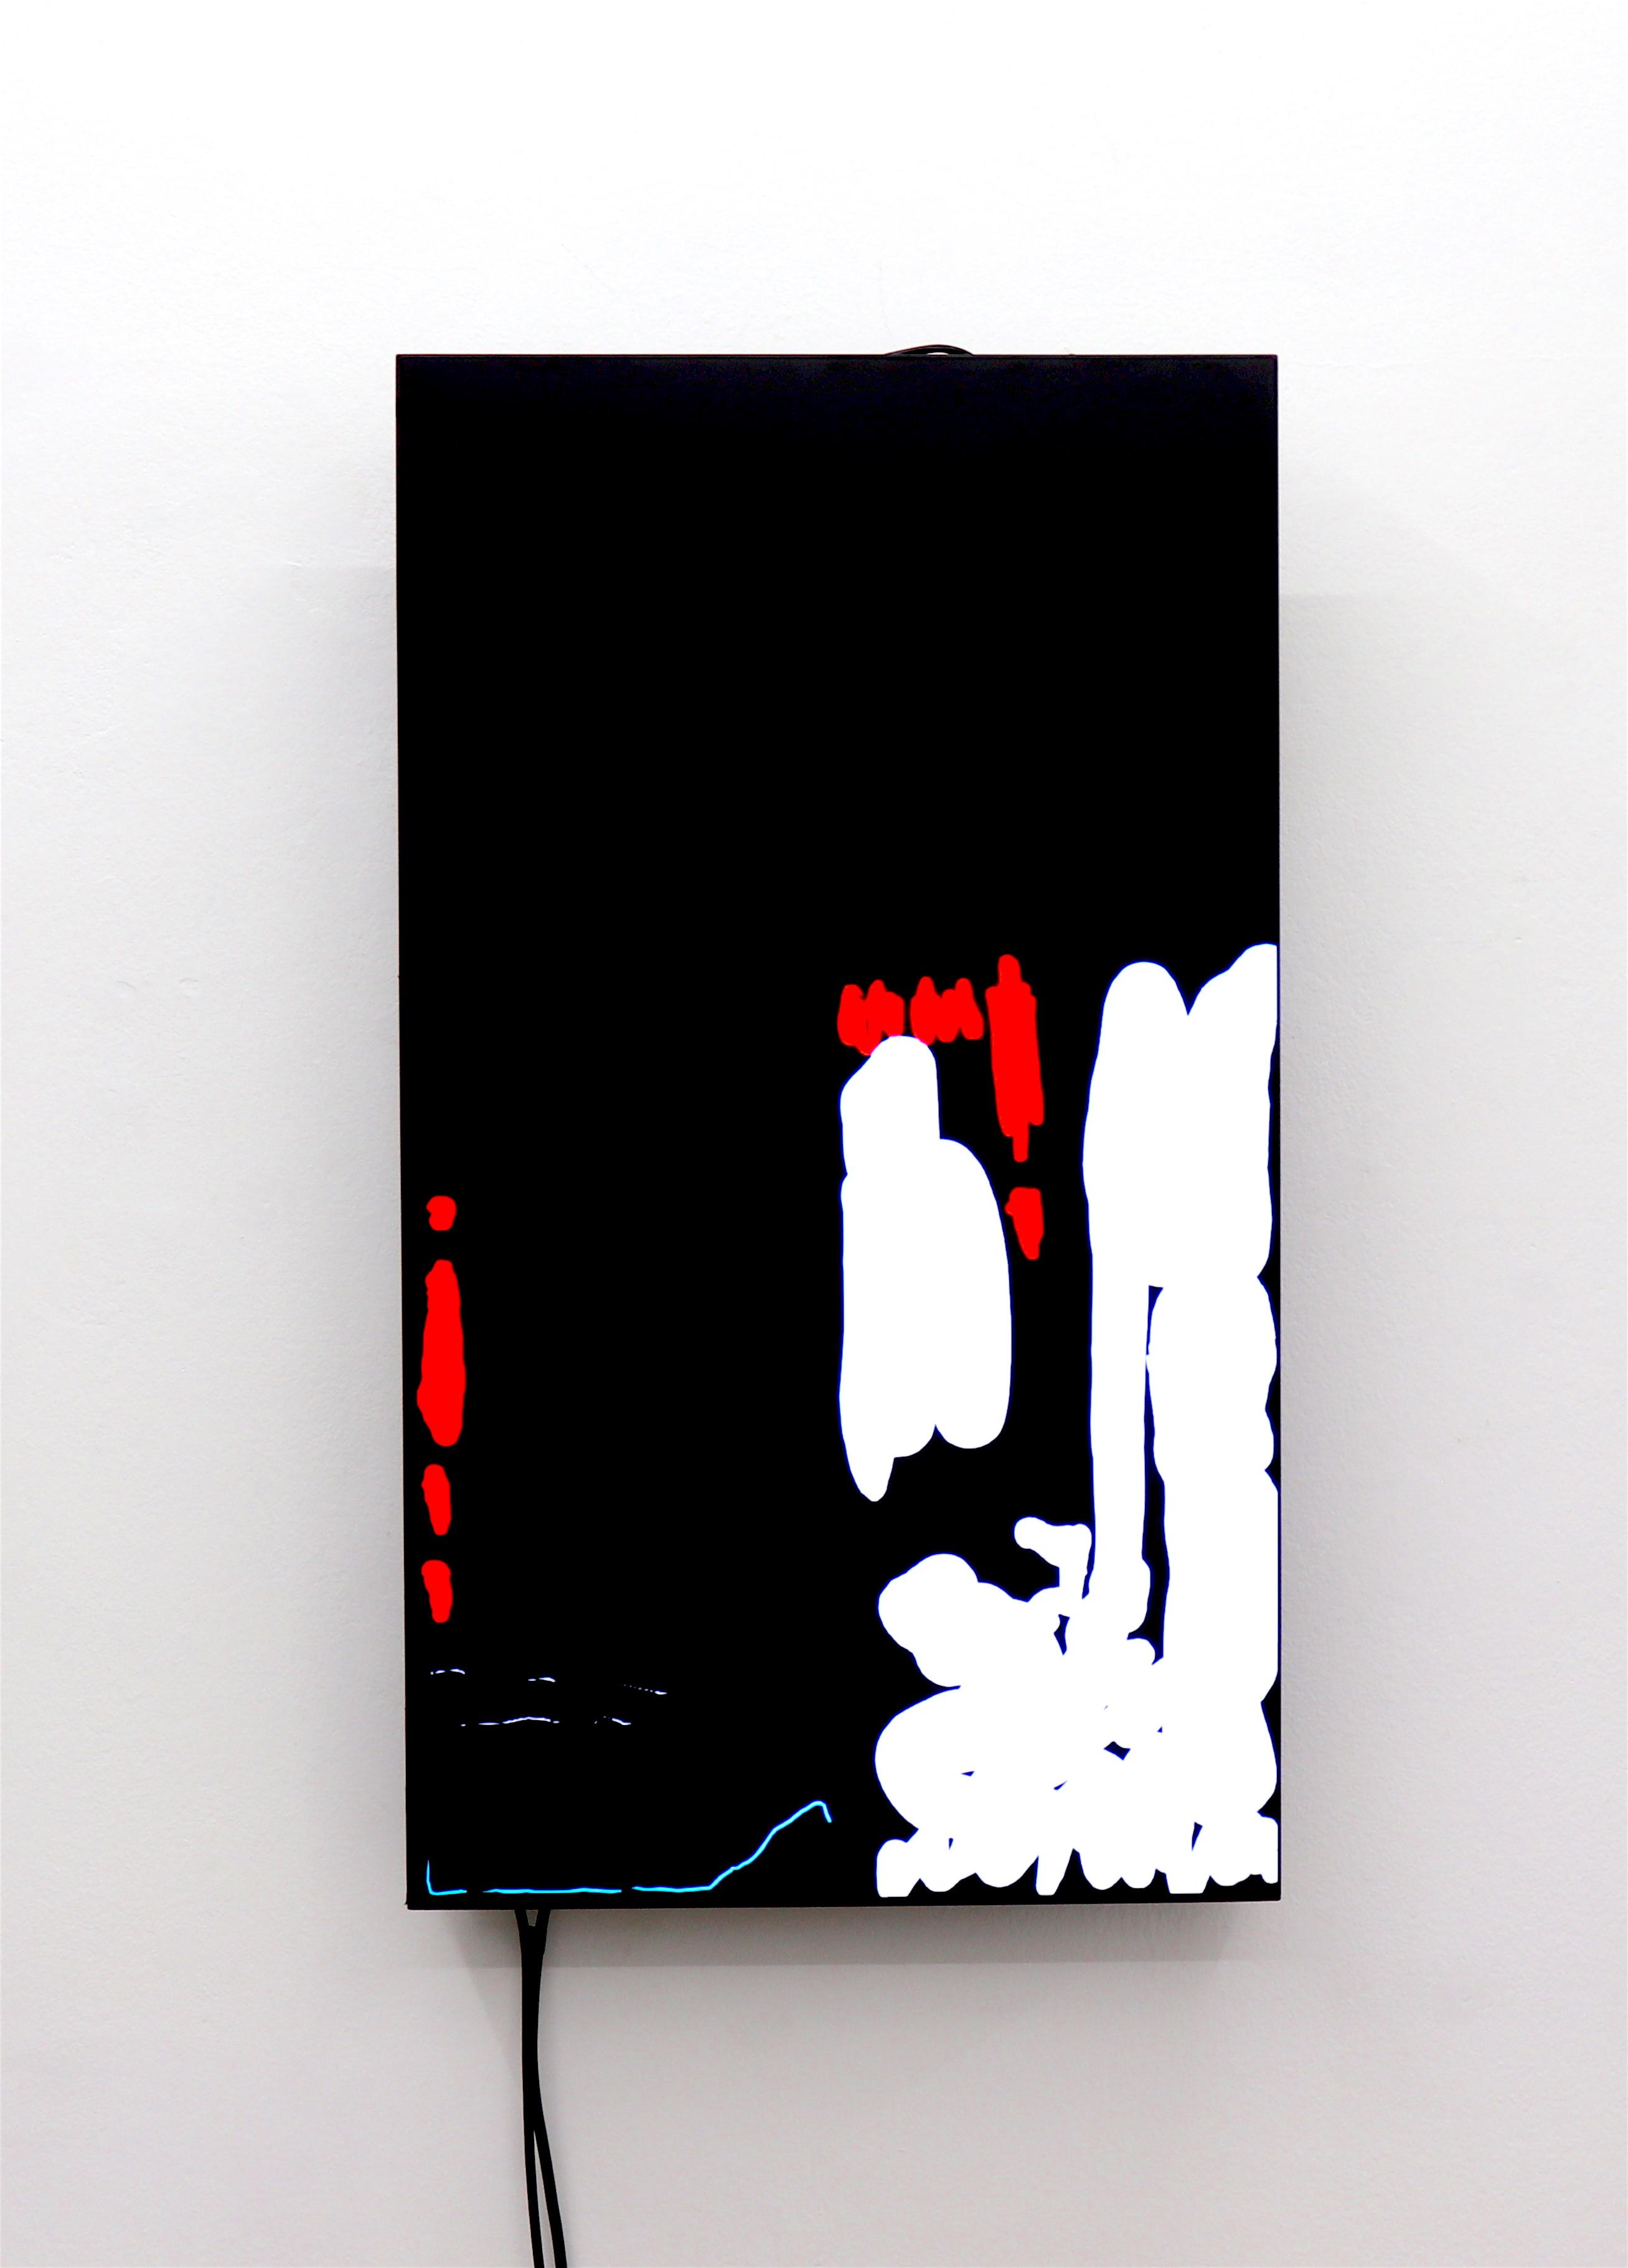 "Fixer The Beautiful Formula Collective, 2018 Michael Gene Aichner, Daniel Geiger, Oleksiy Koval, Veronika Wenger HD, NEC X462UN 46"" Karin Wimmer Contemporary Art, Munich"